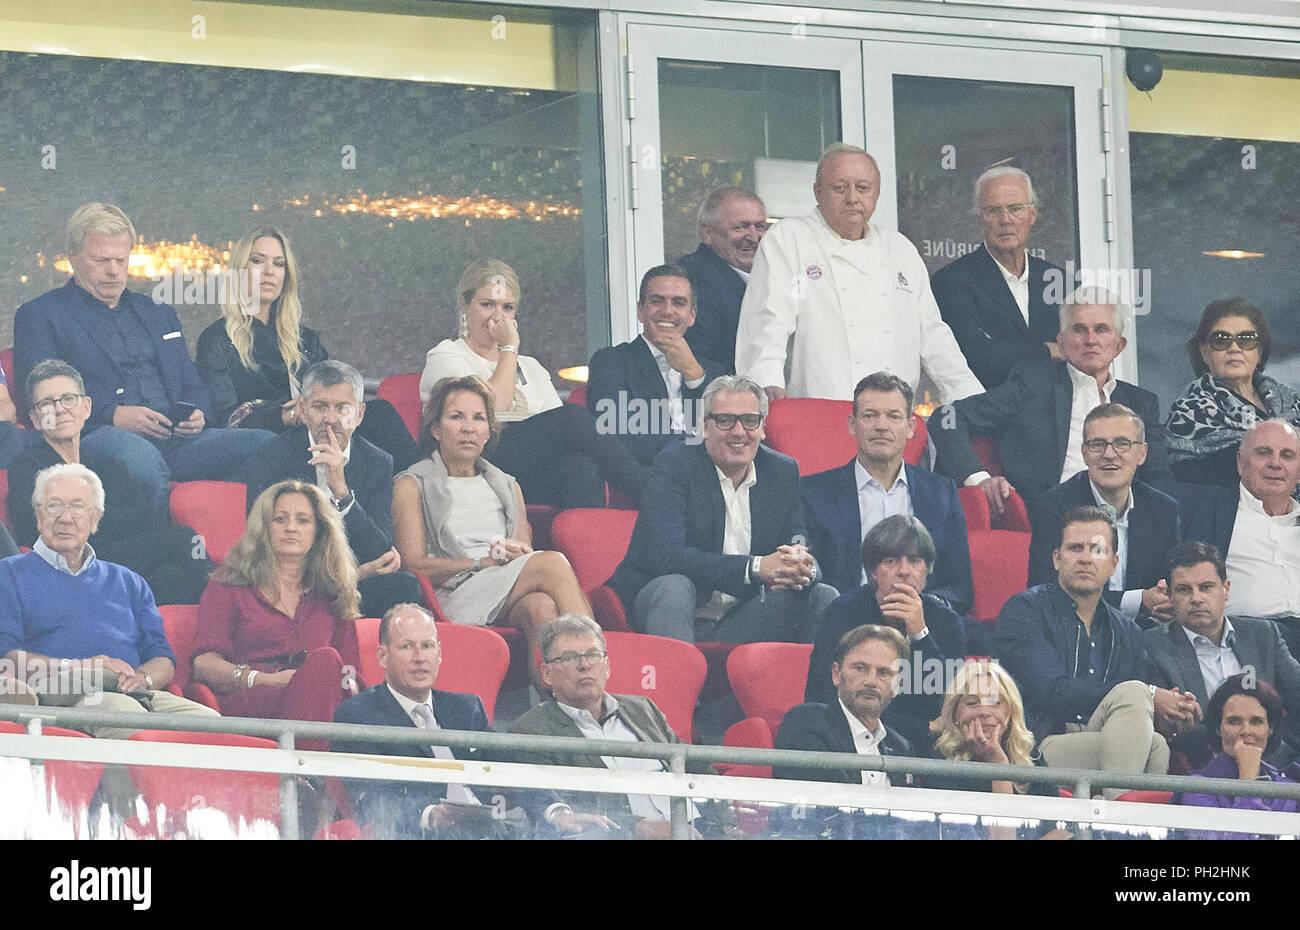 Munich, Germany. 28th August 2018. FC Bayern Munich - Chicago Fire Soccer, Munich, August 28, 2018 Oliver KAHN with his wife Svenja, Herbert HAINER, former CEO Adidas, Karl-Heinz RUMMENIGGE (CEO, Vorstandsvorsitzender FCB AG), President und chairman Uli HOENESS (FCB), Jan-Christian Dreesen , managing financial director FCB, Andreas JUNG, Marketing director and board member FCB, Joerg WACKER, managing director international affairs, manager, officer,  DFB headcoach Joachim Jogi LOEW, LÖW,Oliver BIERHOFF, Manager, Teammanager DFB, Jupp Heynckes, former FCB coach with his wife Iris,  Philipp LAHM - Stock Image